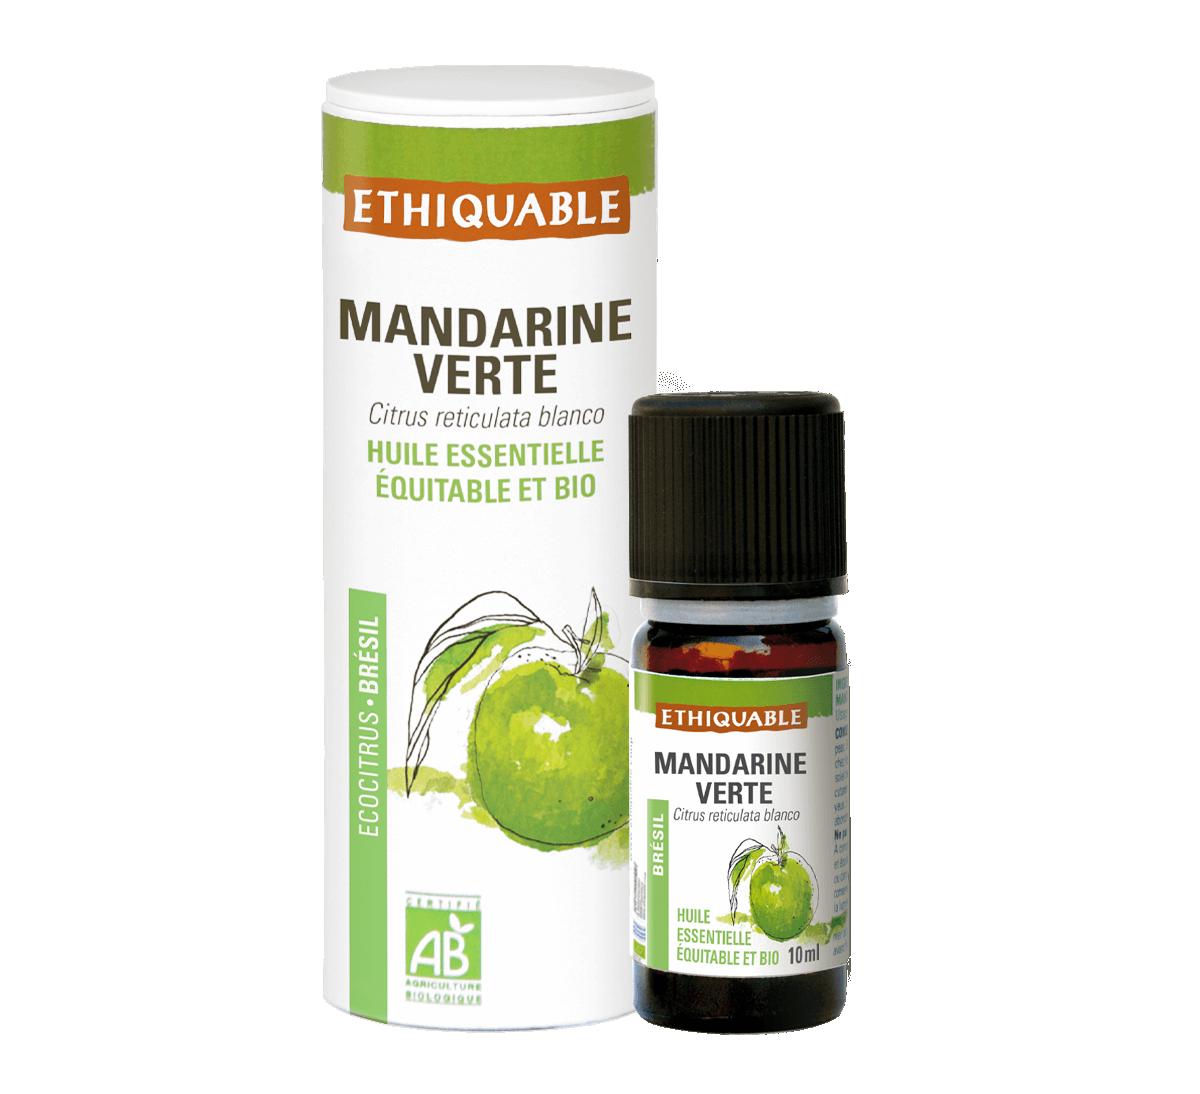 Ethiquable - Huile essentielle de mandarine verte bio issue du commerce équitable